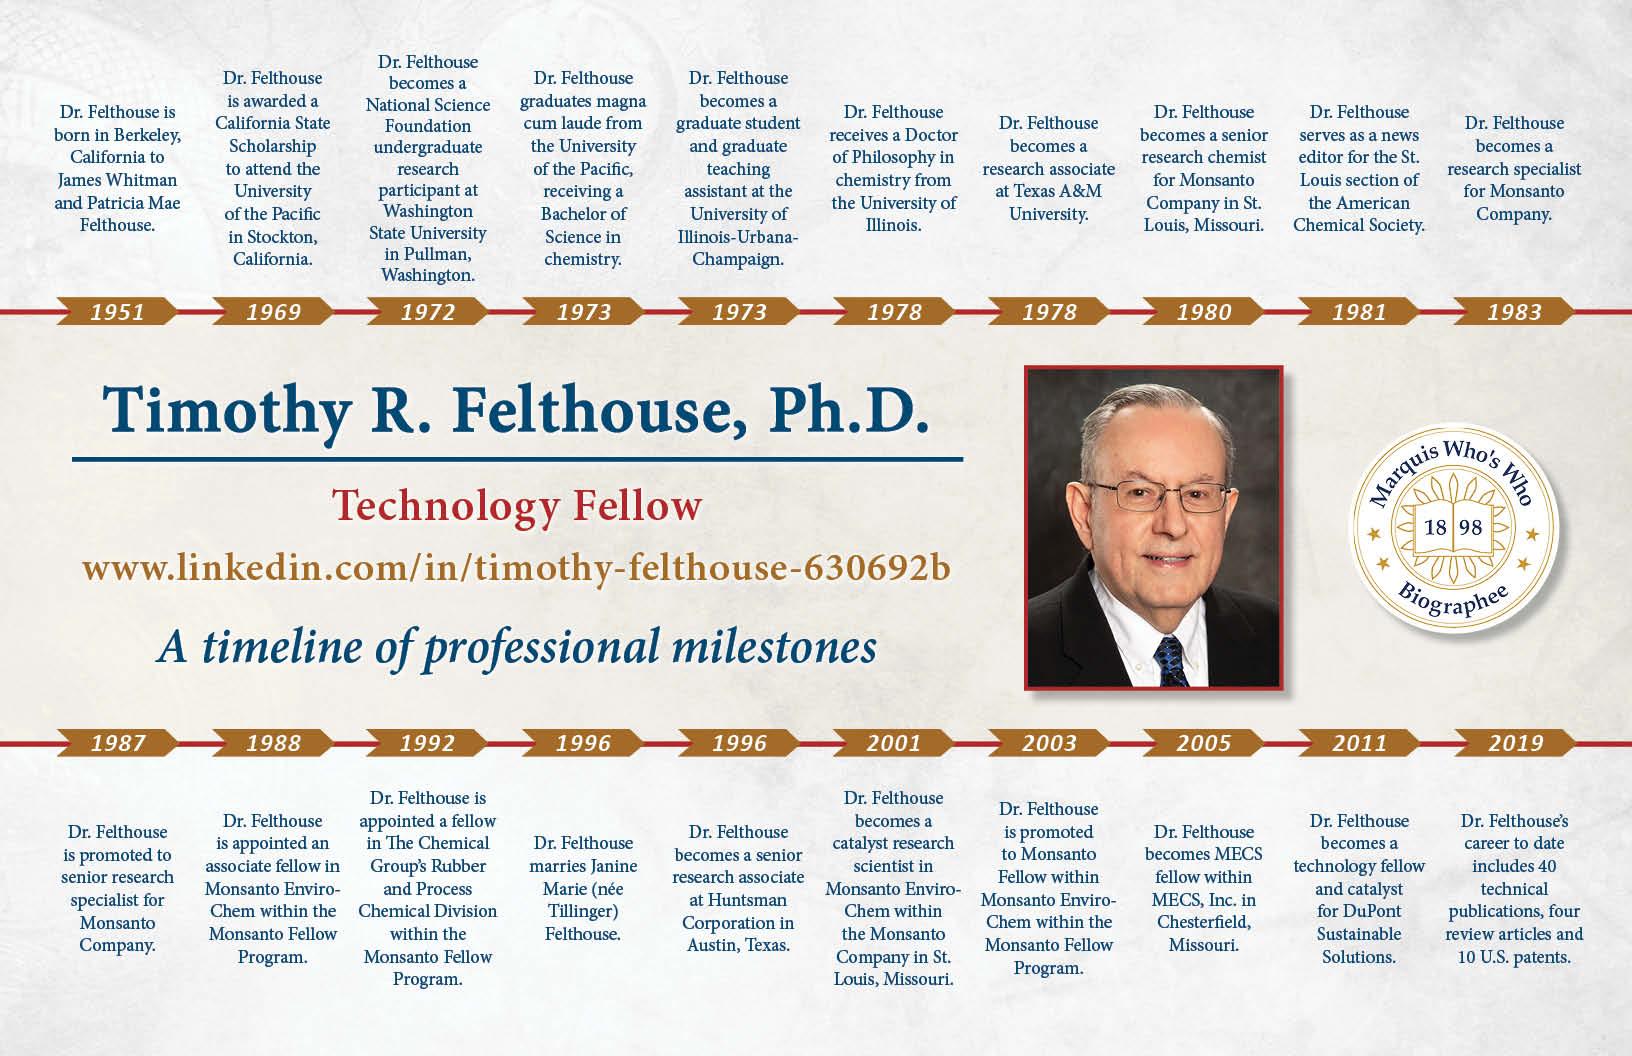 Timothy Felthouse Professional Milestones